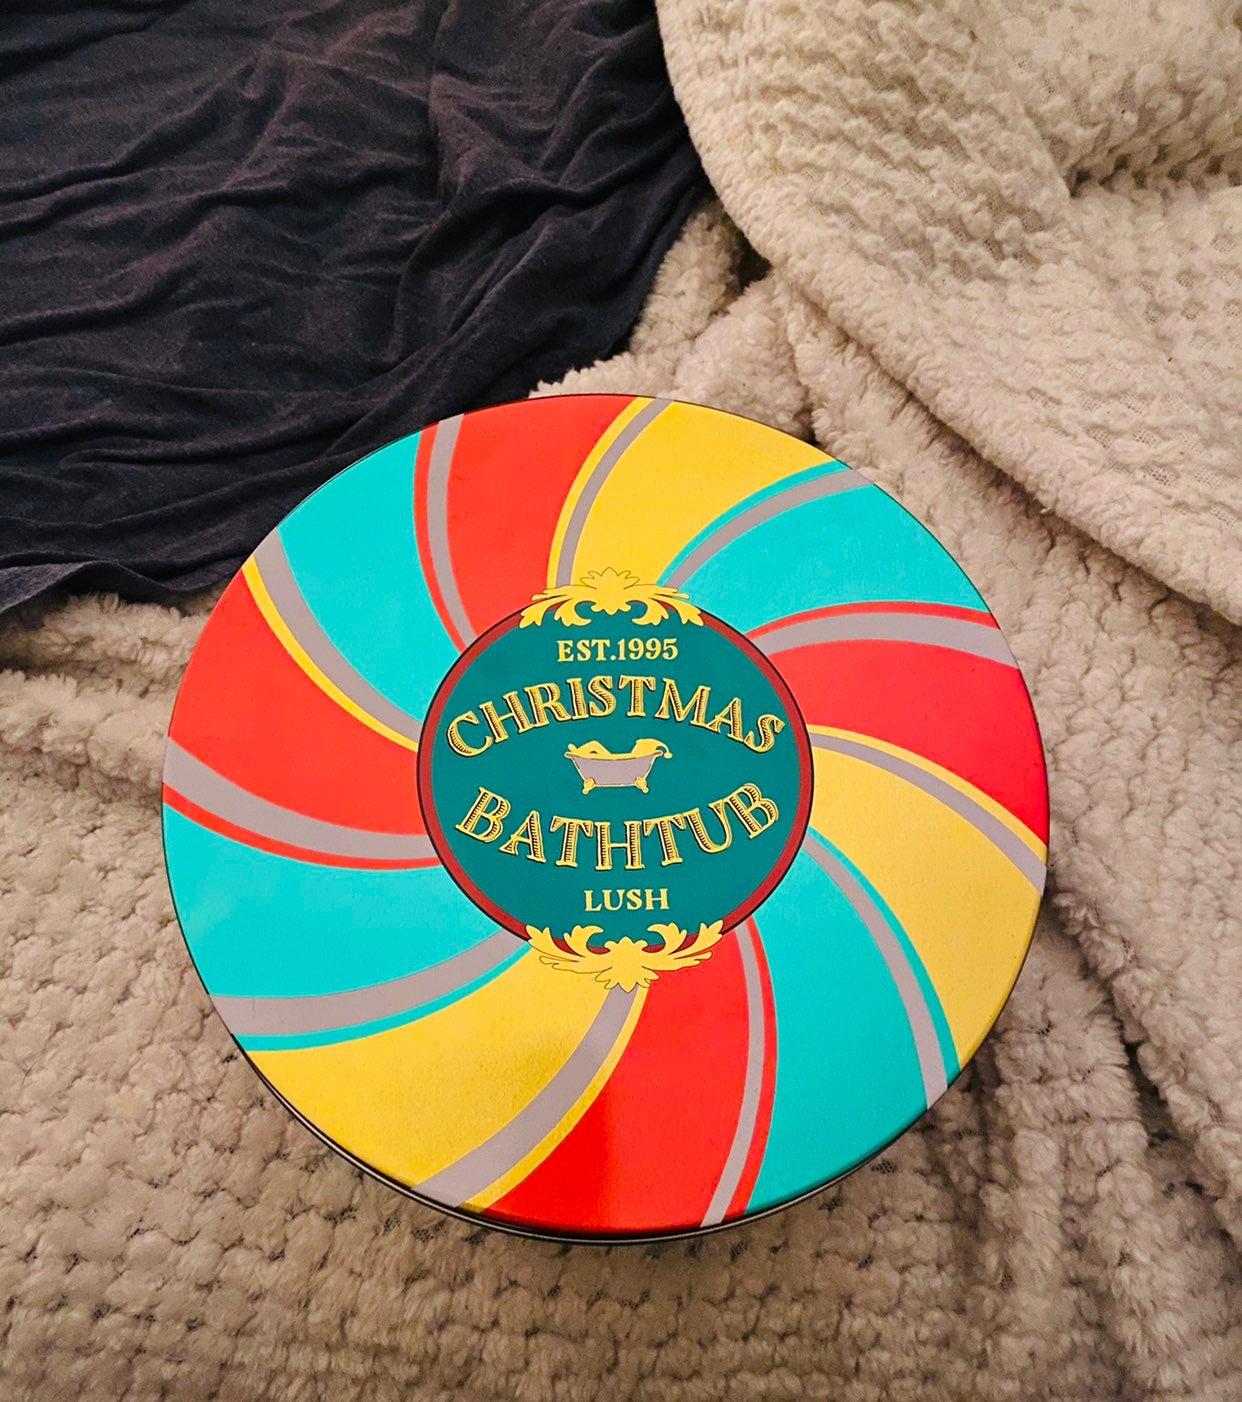 Lush Christmas Bath Bomb Tin